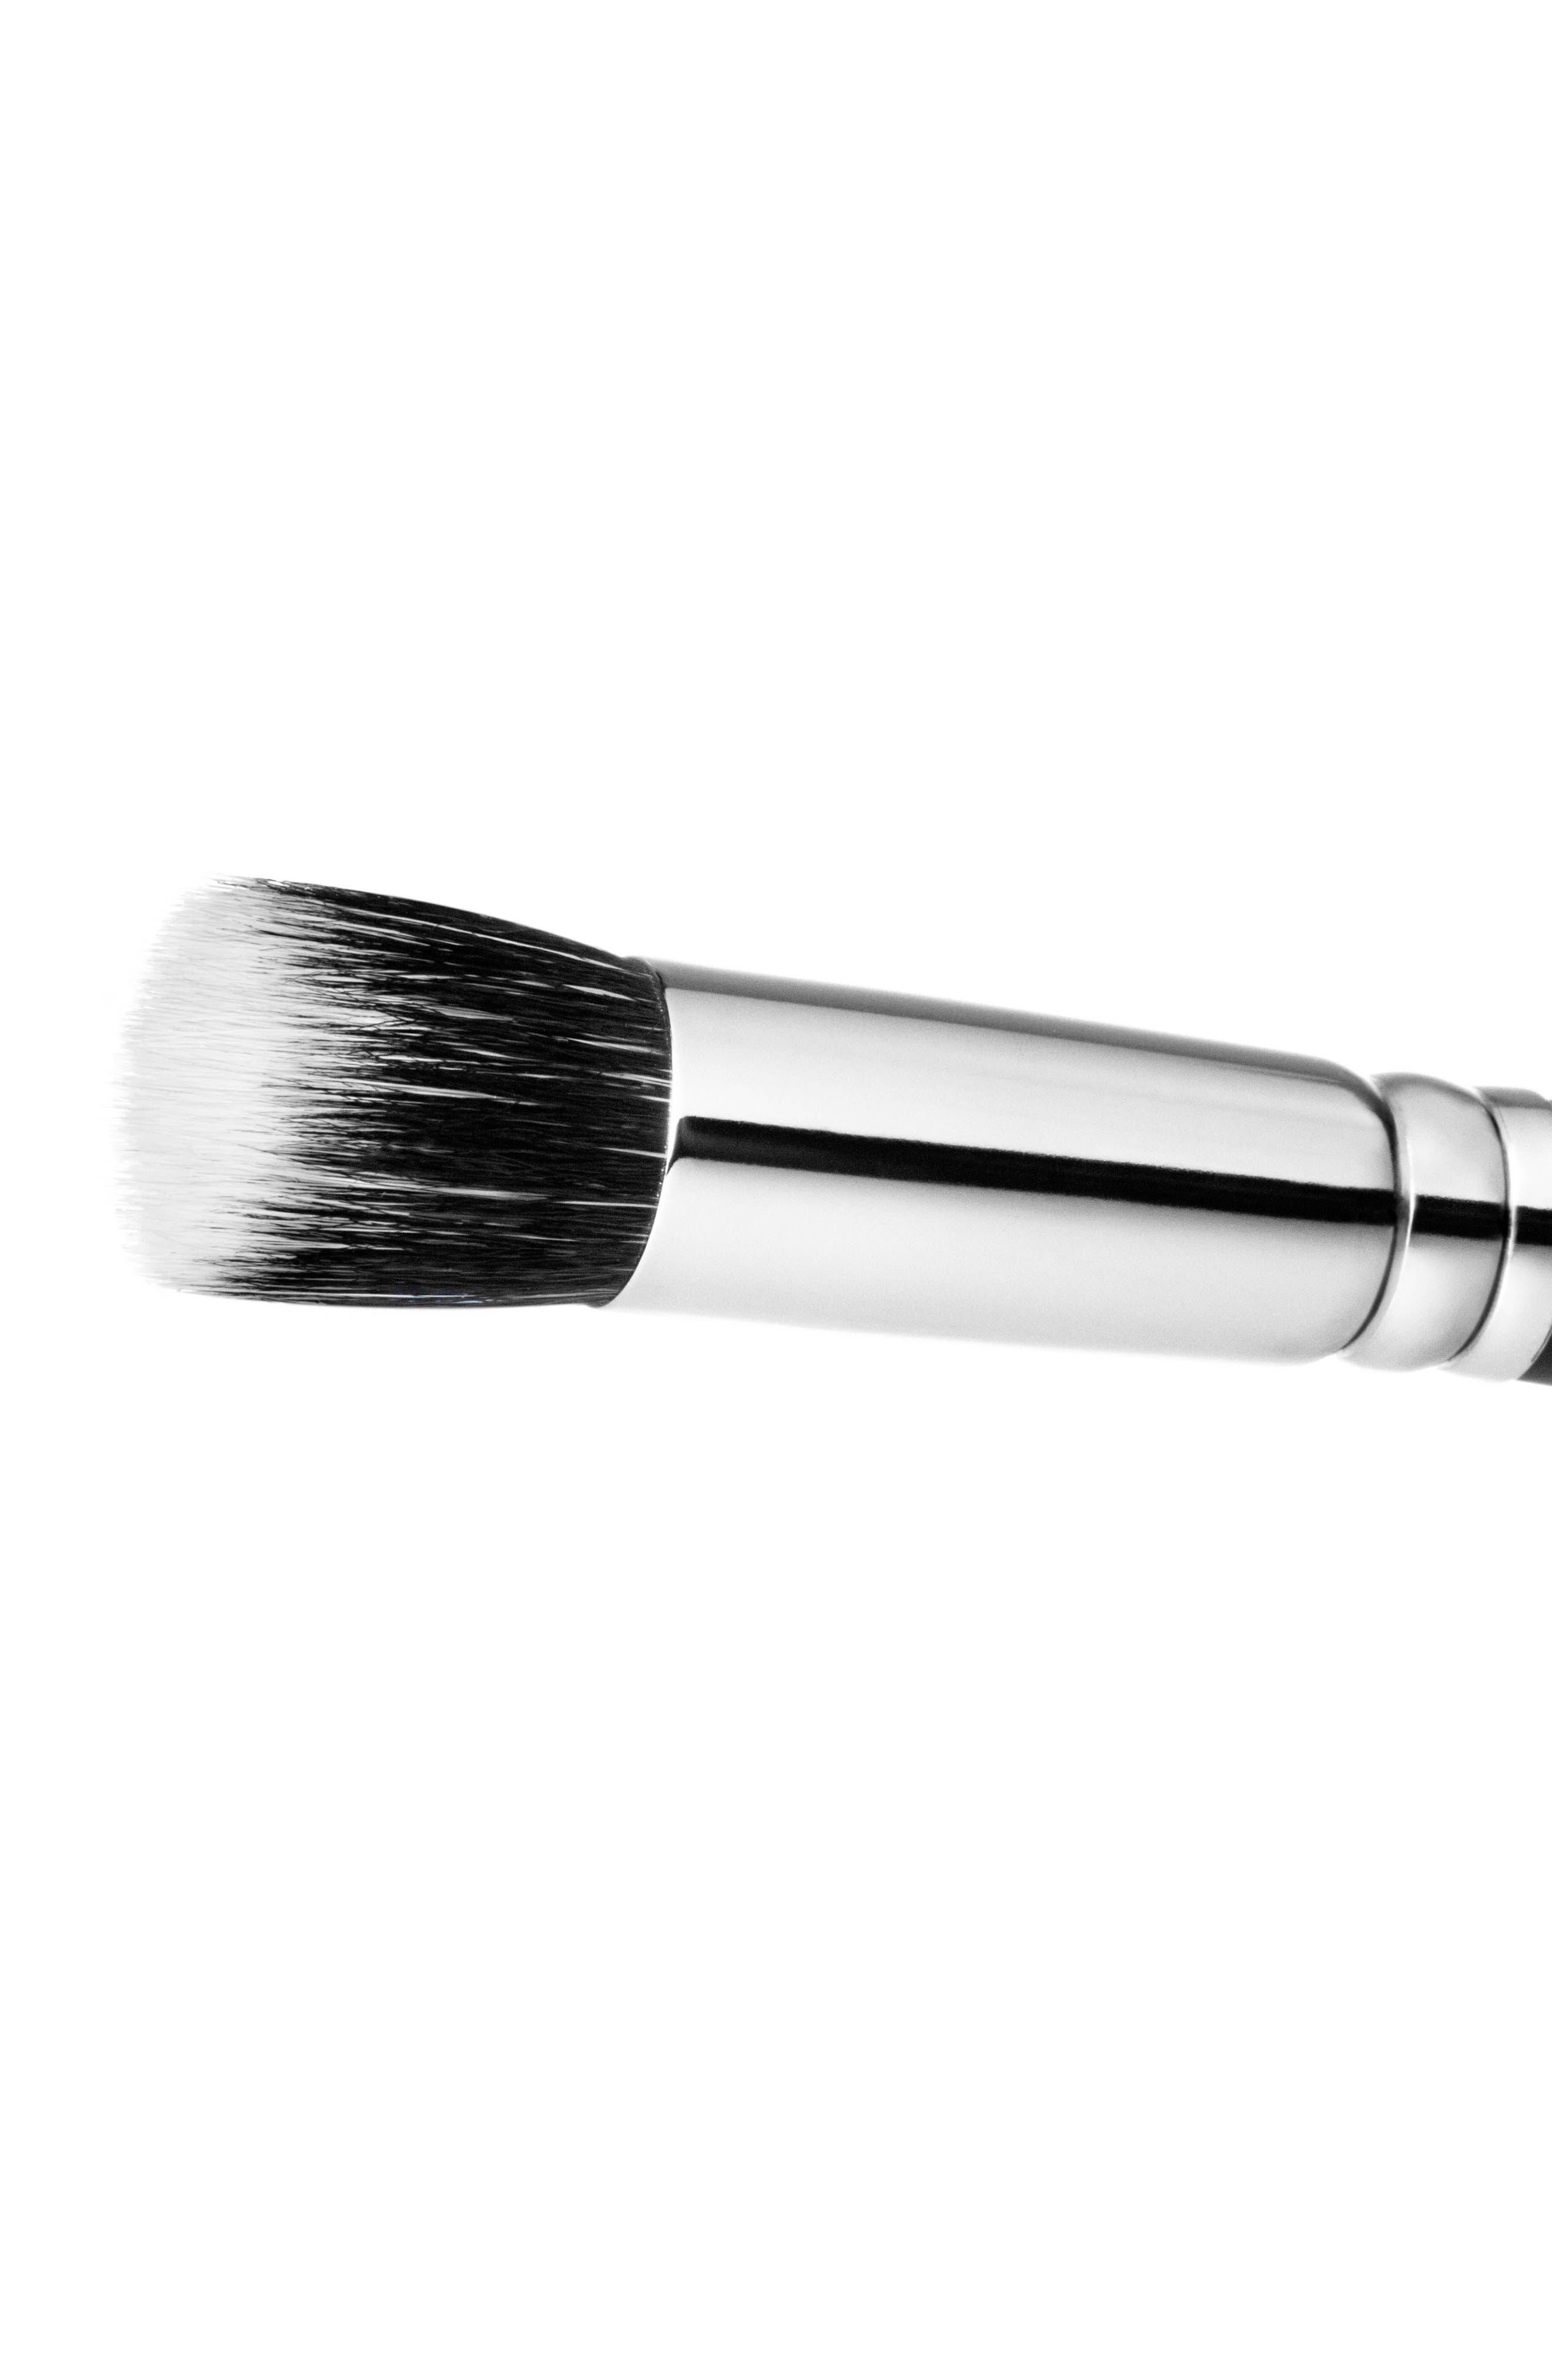 MAC 130S Synthetic Short Duo Fibre Brush,                             Alternate thumbnail 2, color,                             NO COLOR